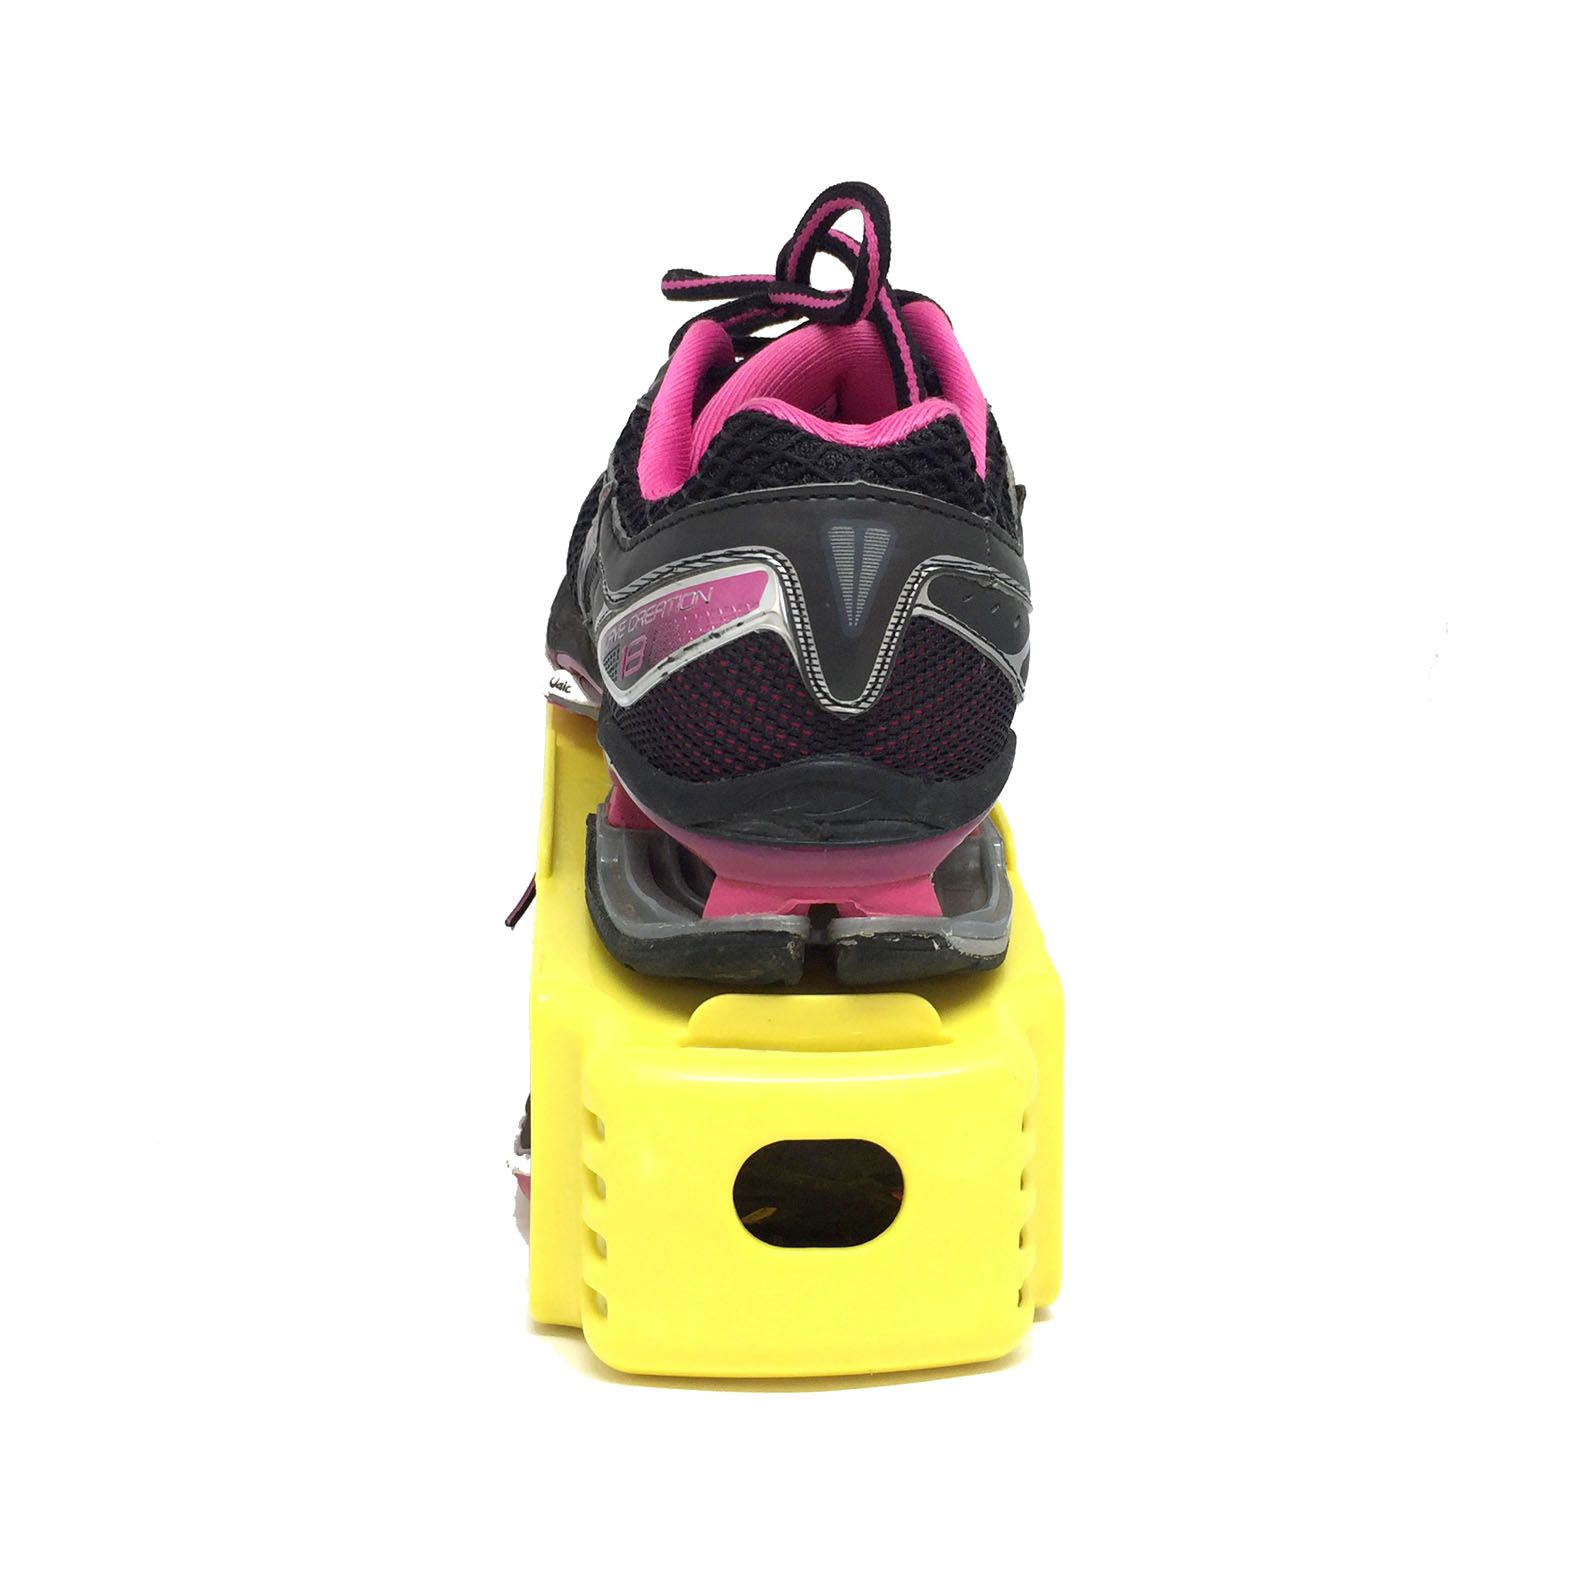 Organizador de Sapato Rack com 20 unidades Amarelo  - Shop Ud